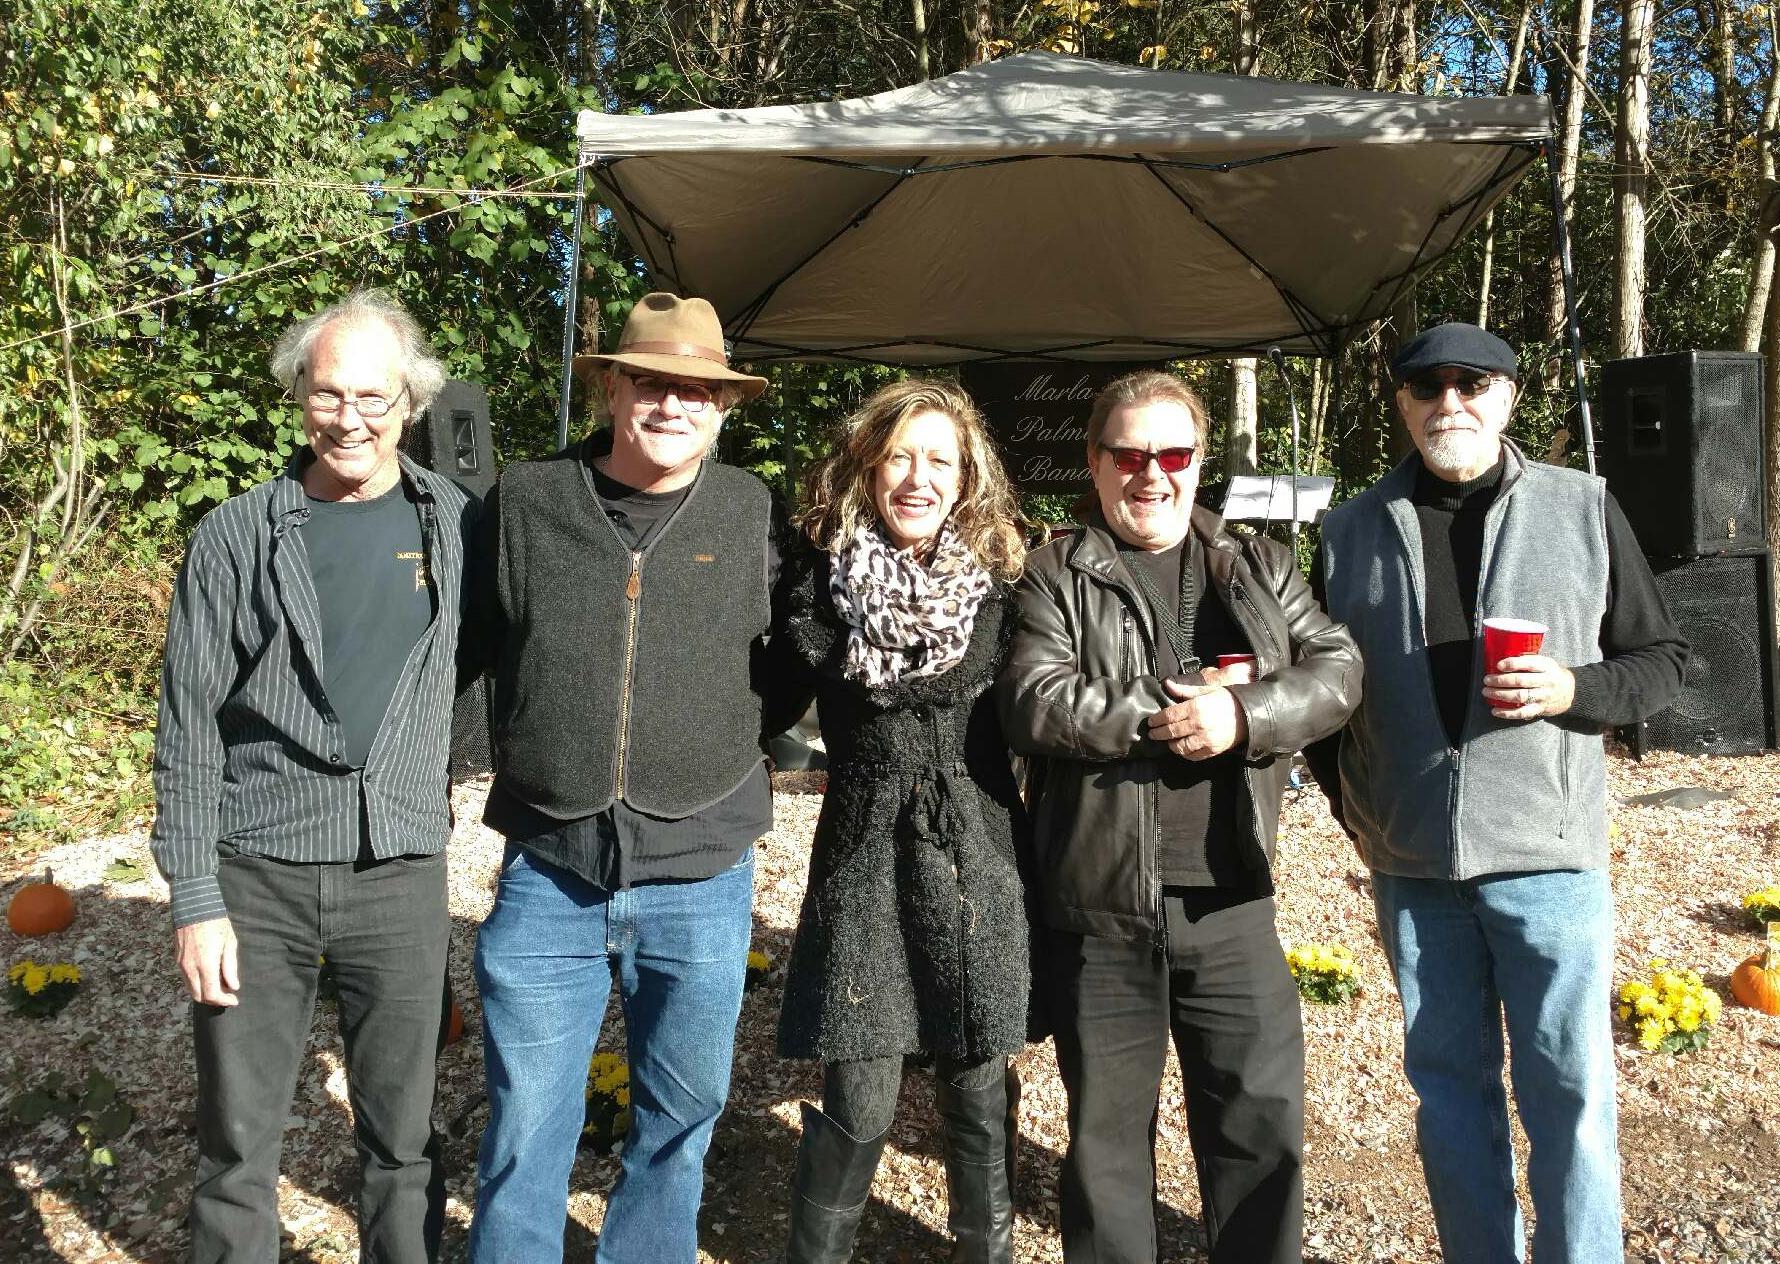 Marla Palma Band